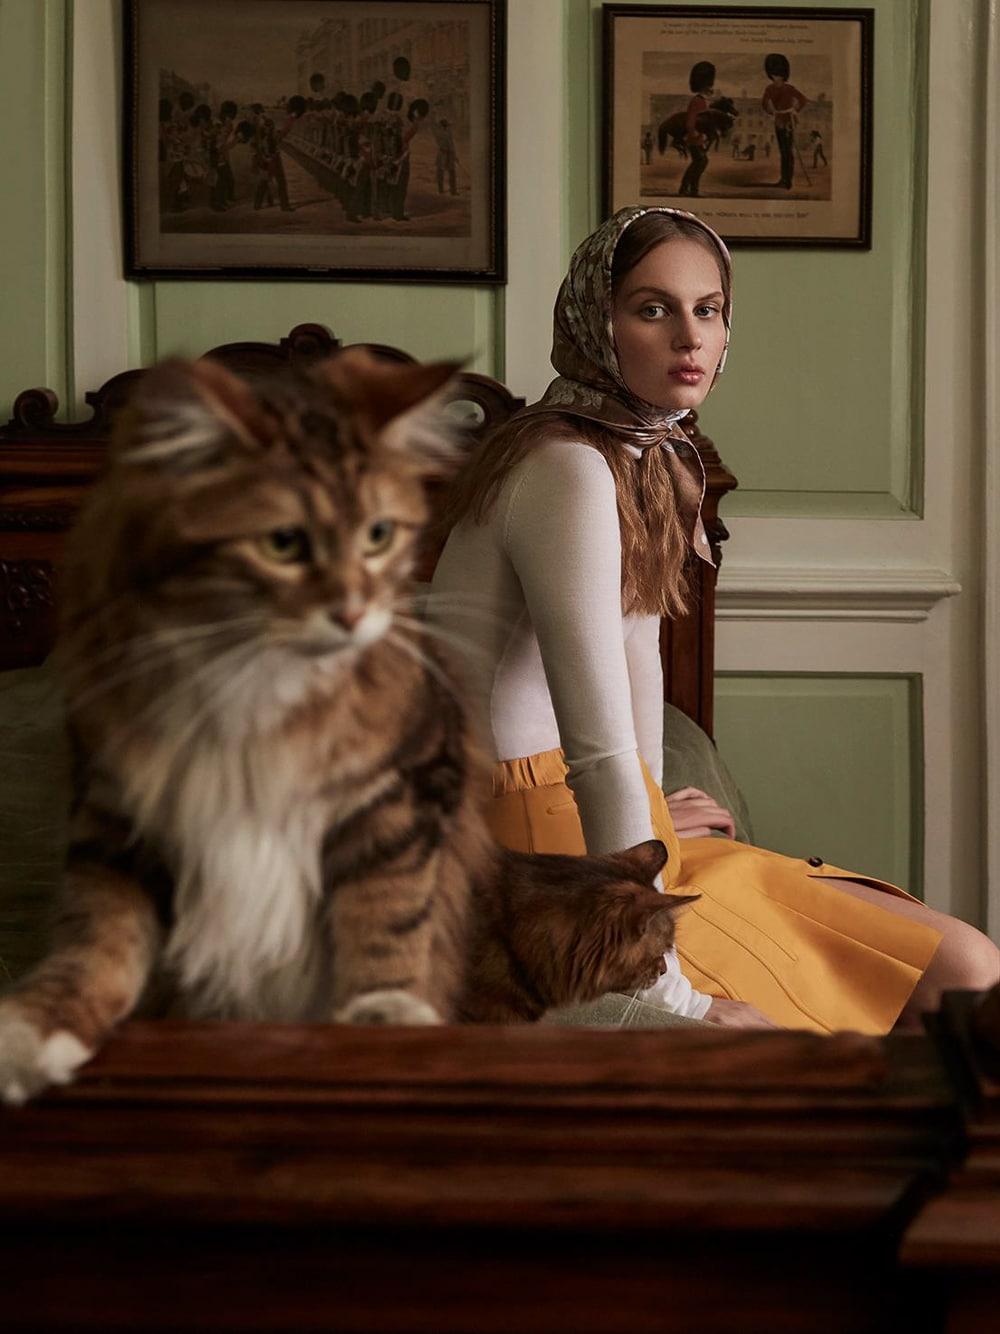 Harpers-Bazaar-UK-Septamber-2018-Florence-Kosky-Agata-Pospieszynska-7.jpg